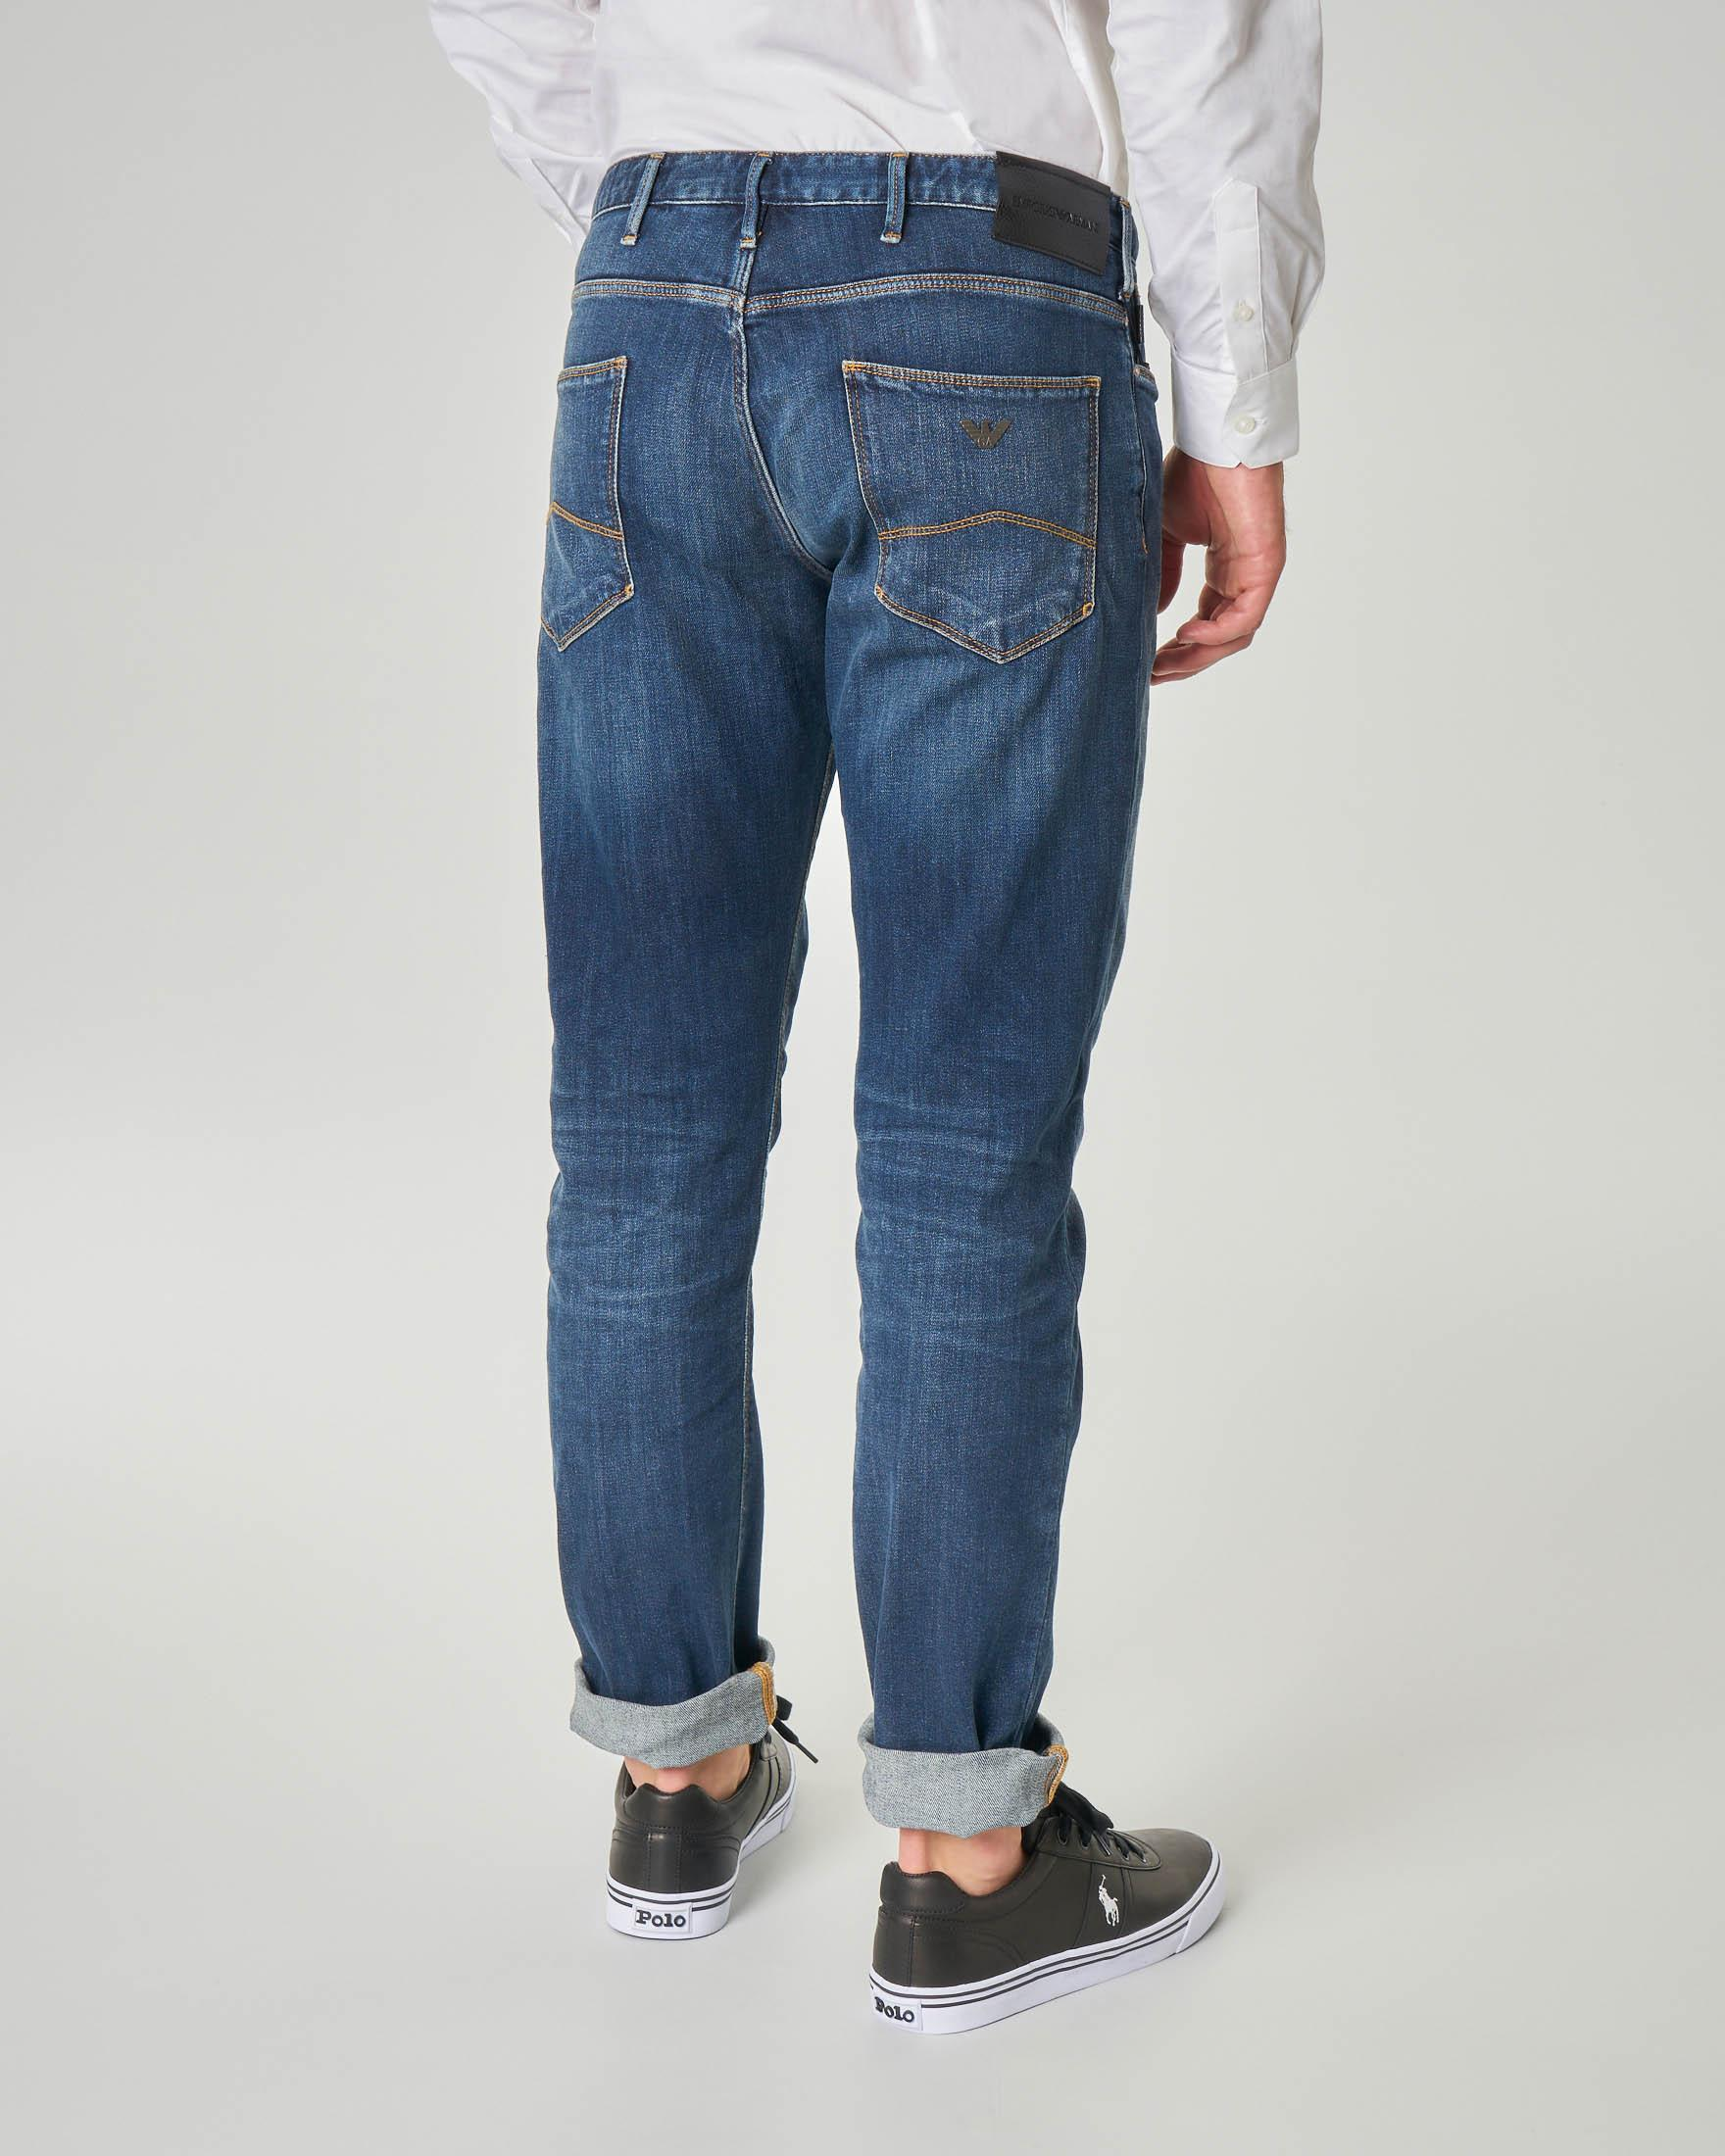 Jeans J06 slim-fit lavaggio stone wash